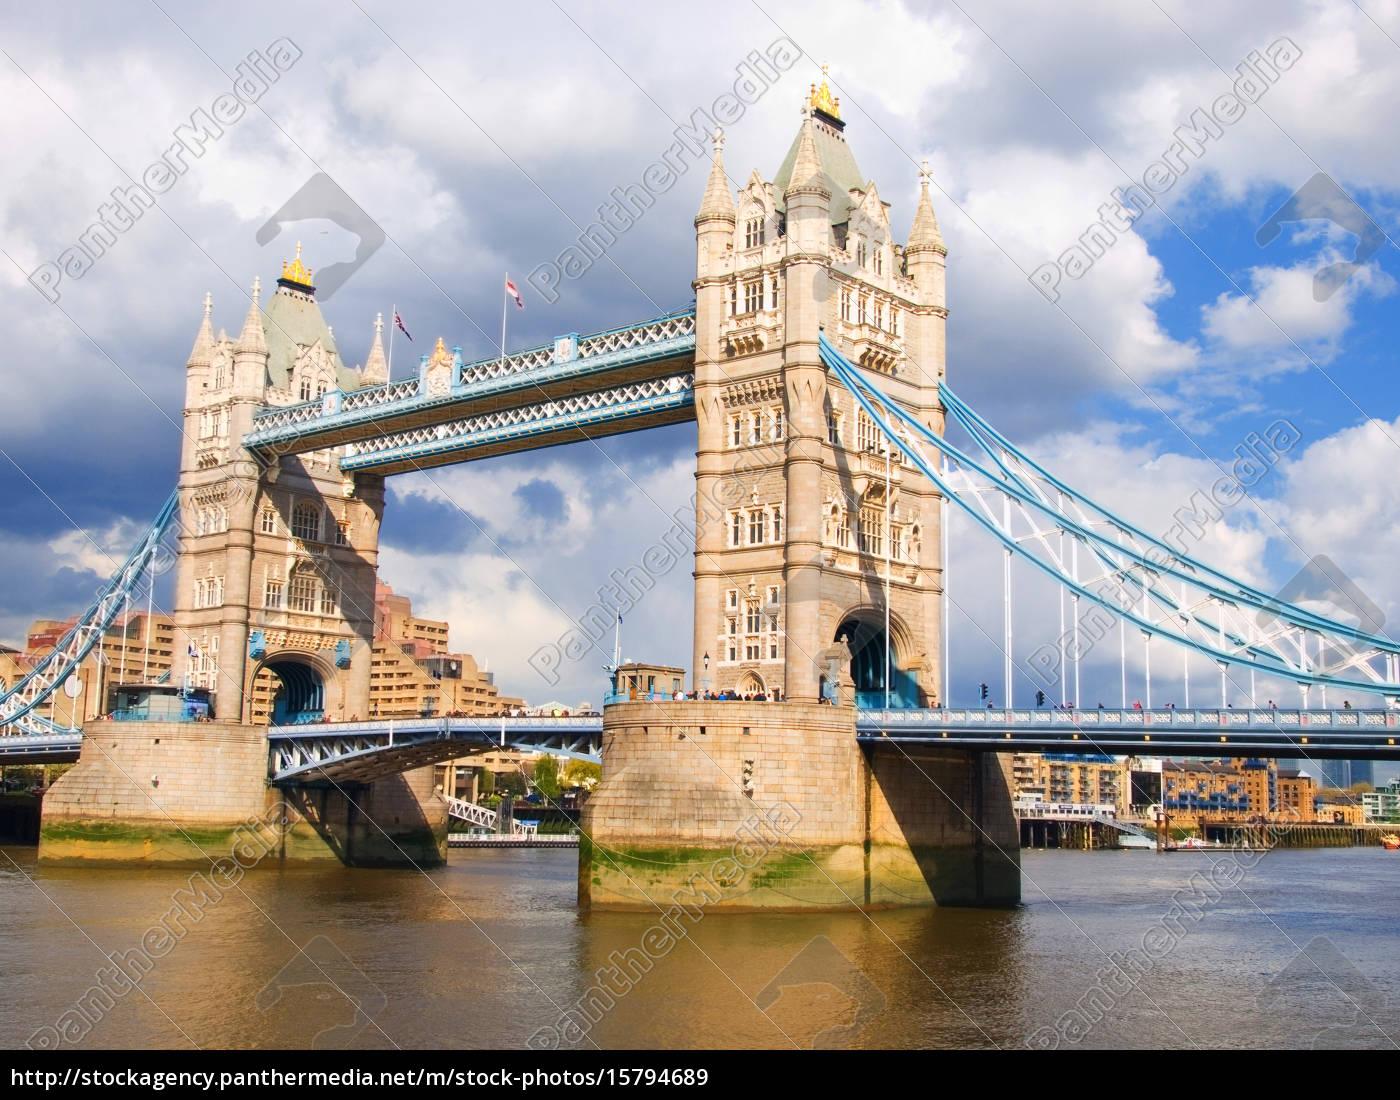 tower, bridge, , lonon, tower, bridge, , lonon, tower, bridge, - 15794689